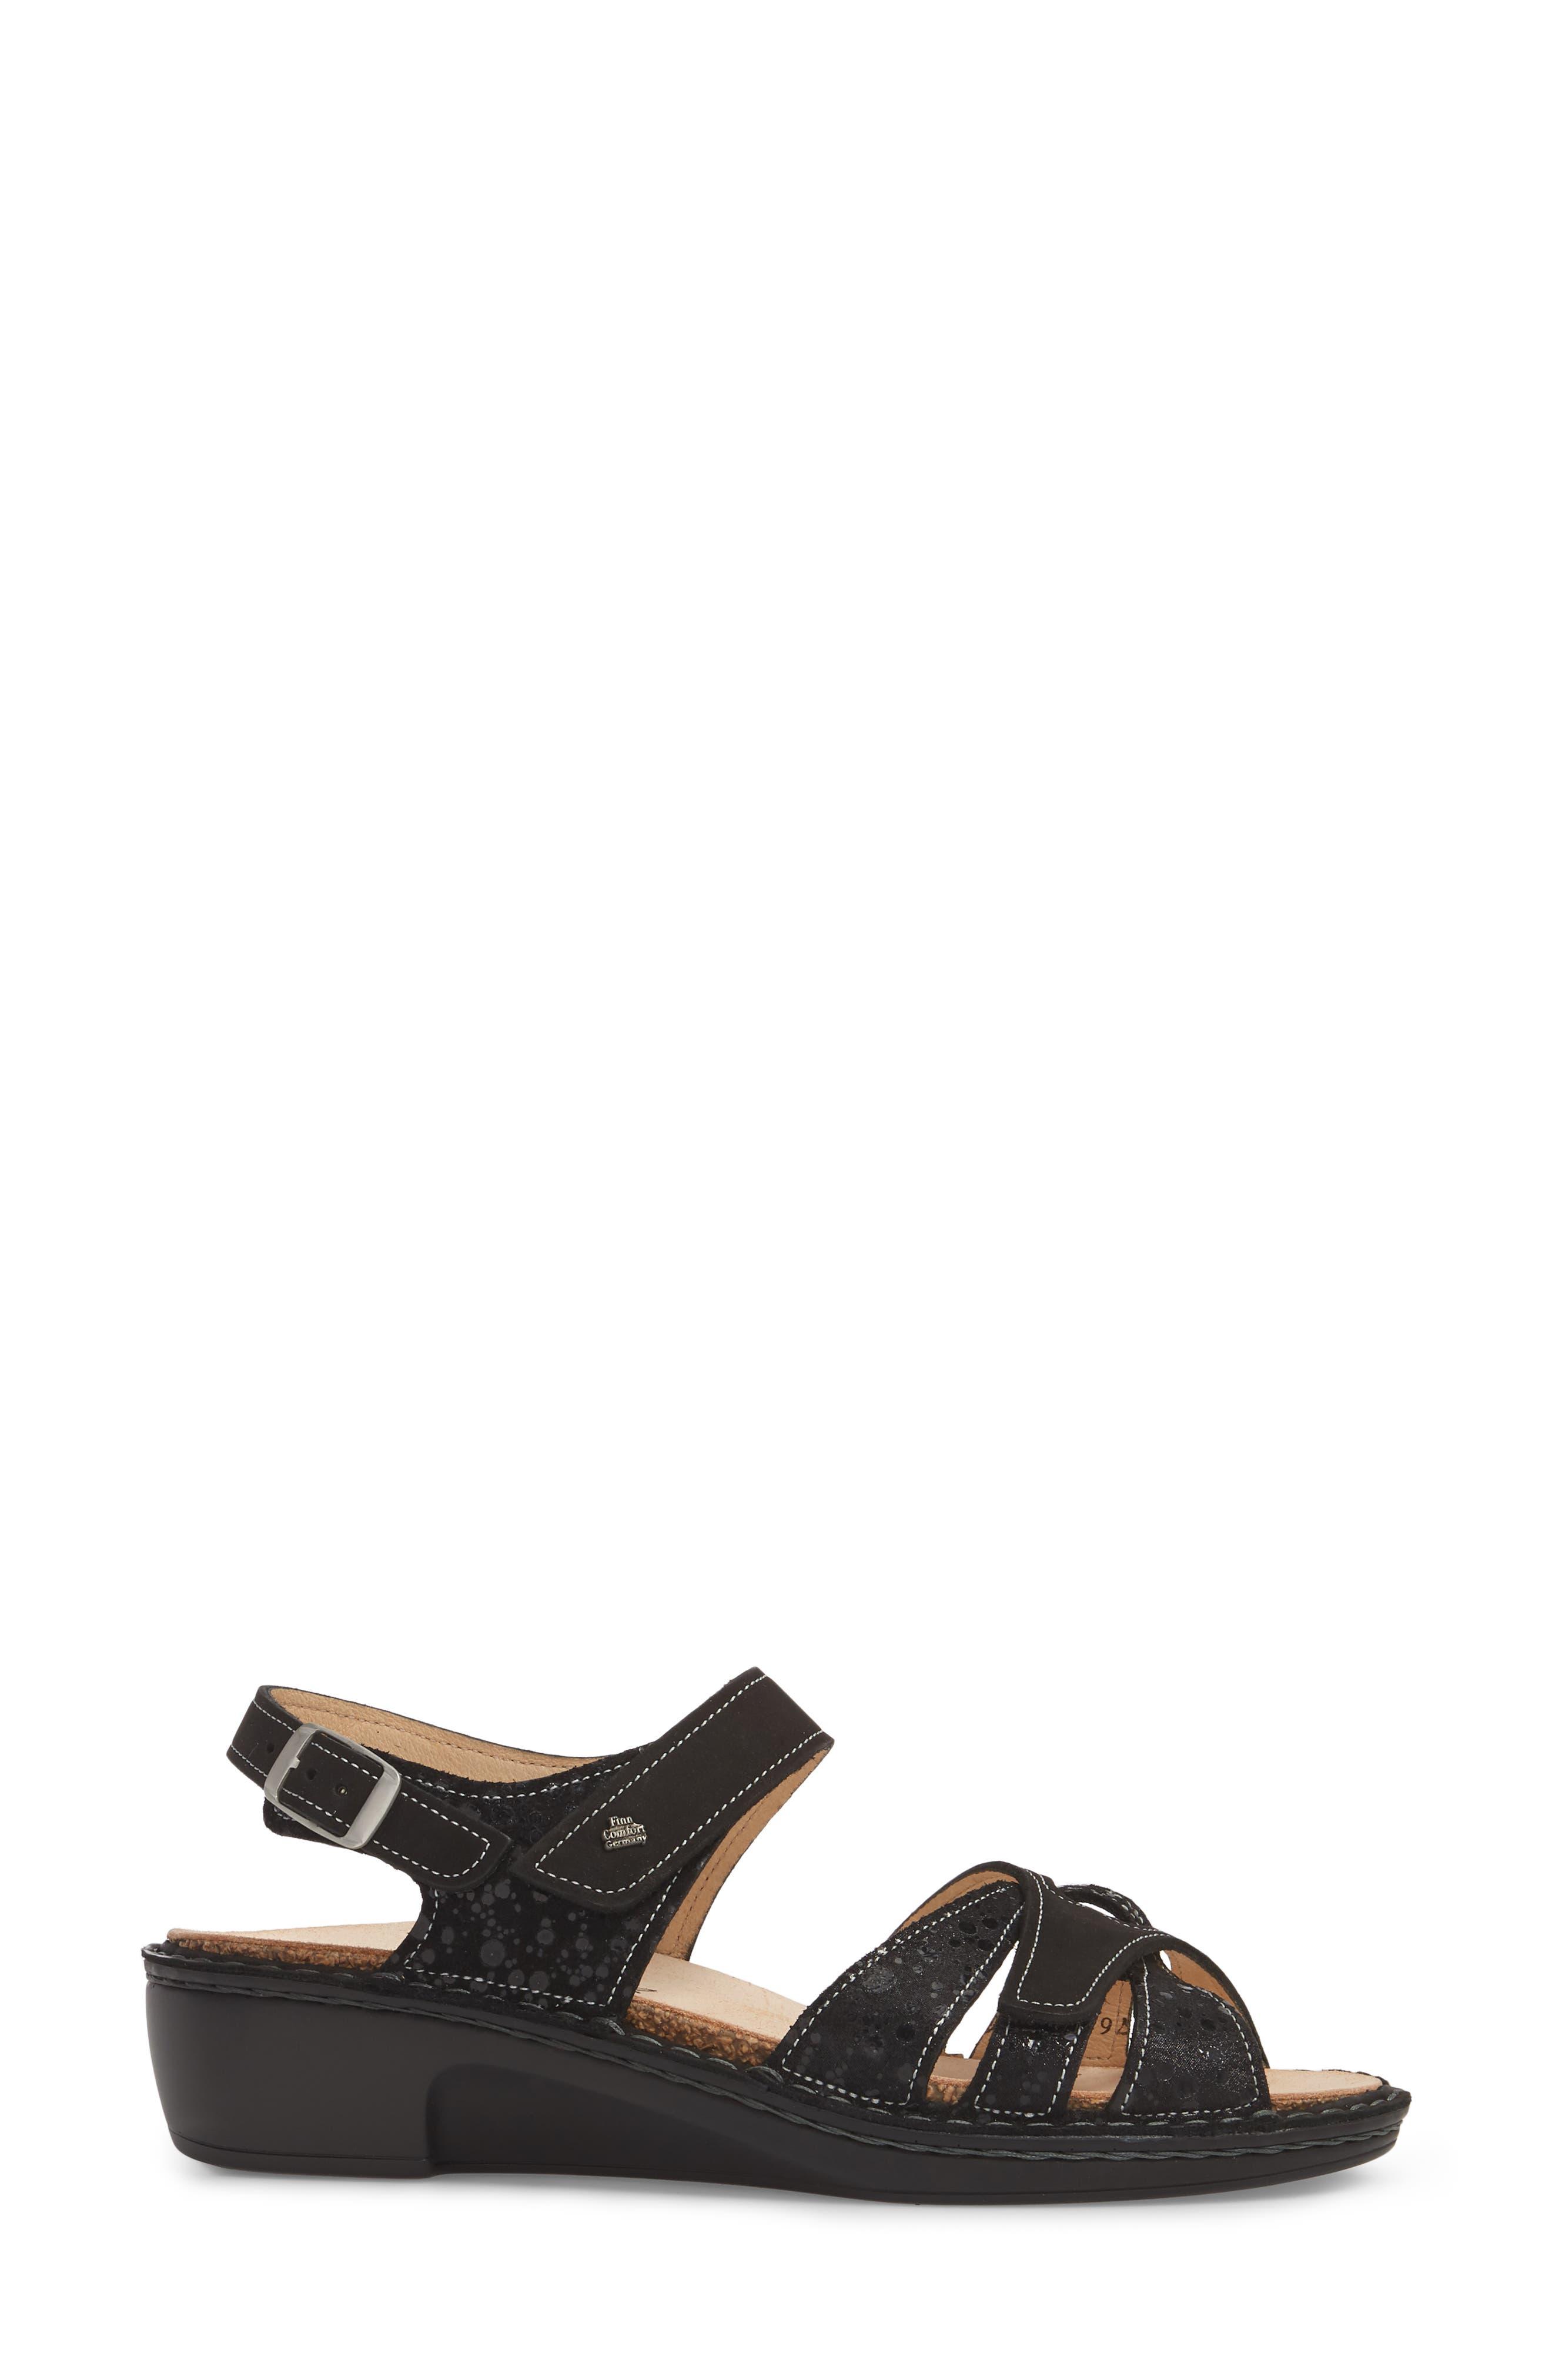 FINN COMFORT, Buka Sandal, Alternate thumbnail 3, color, 001